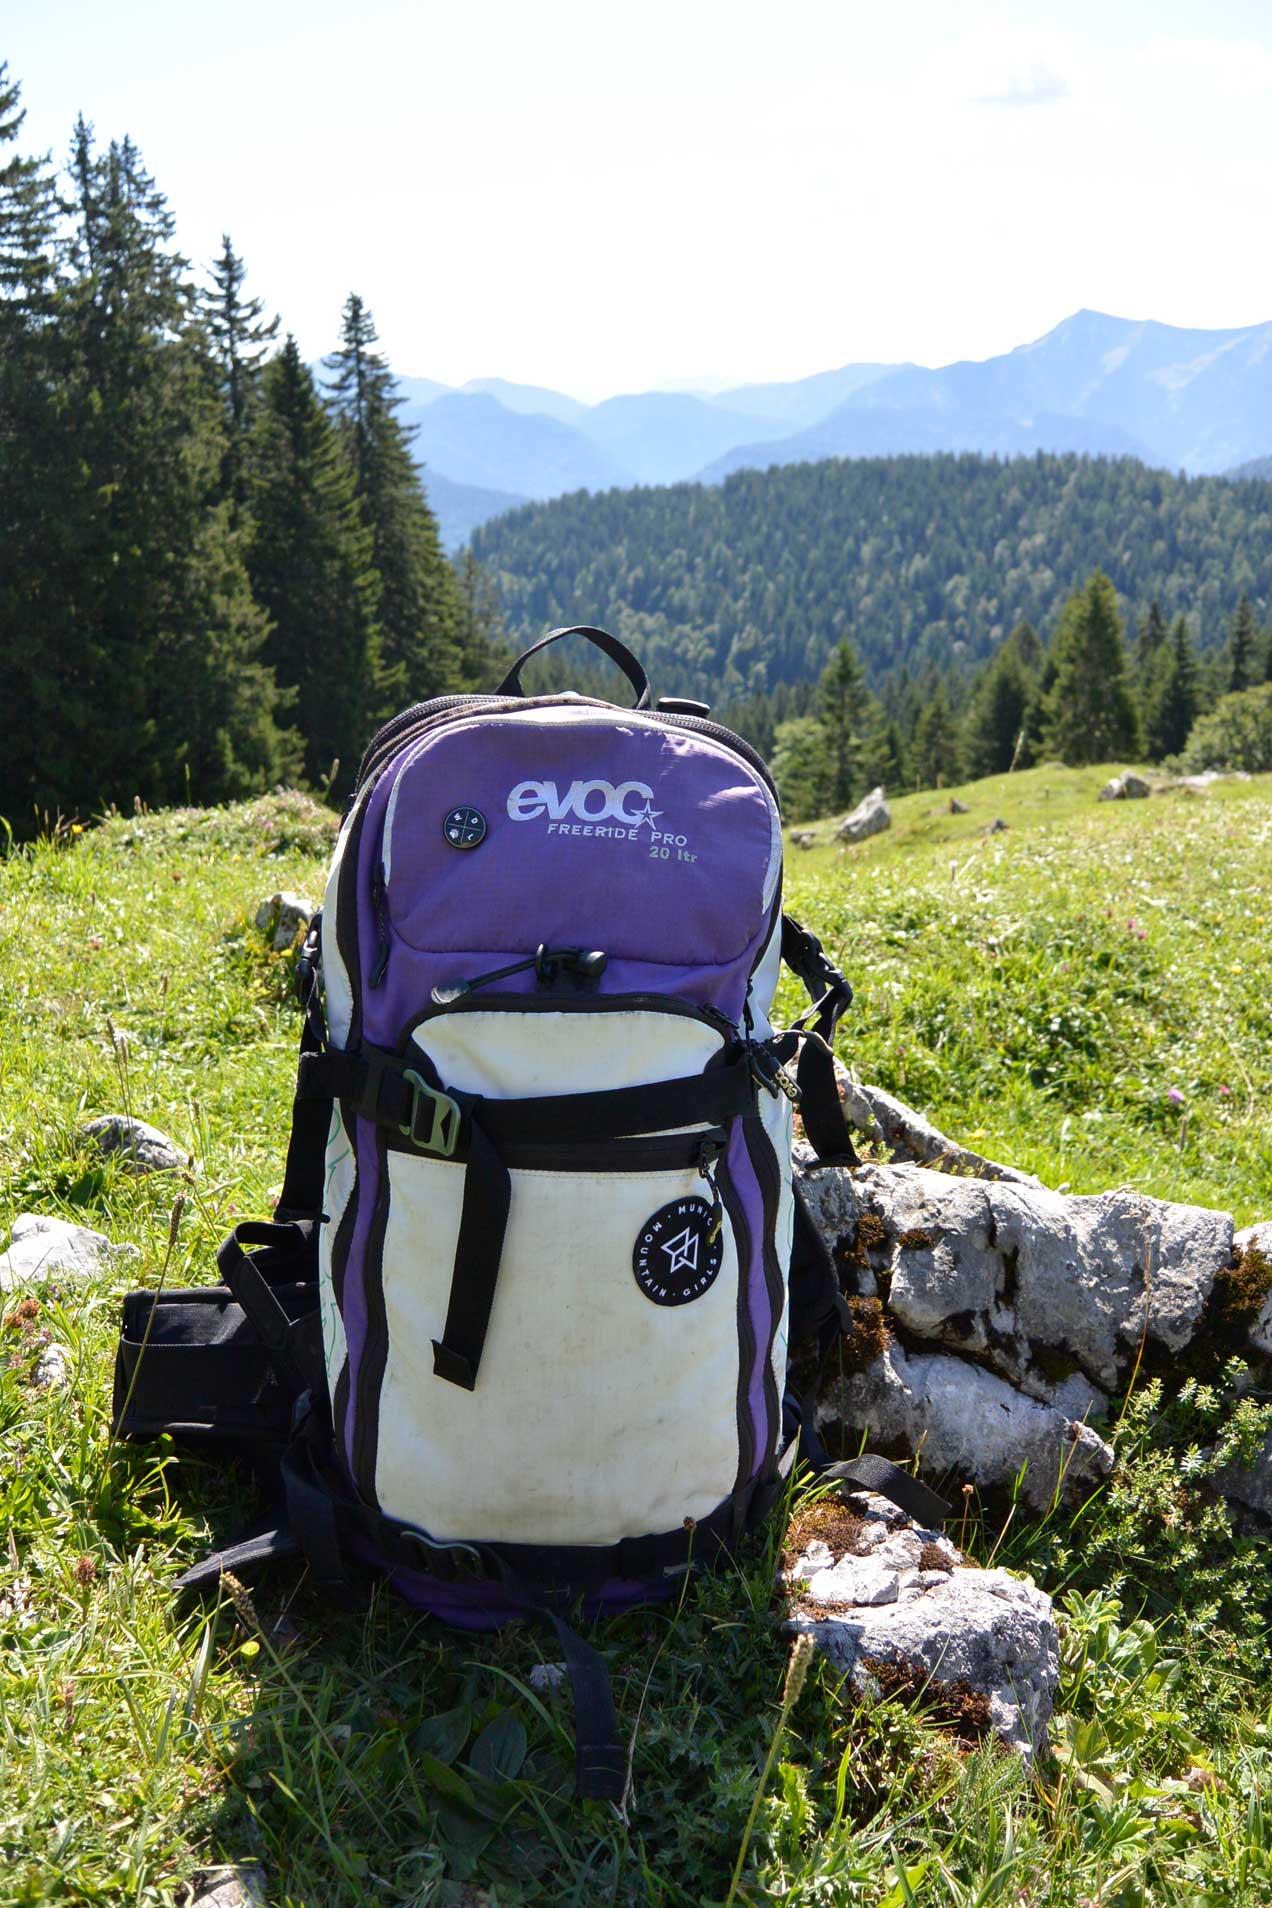 munich-mountain-girls-mtb-ausruestung-frauen-mountainbiken-bike-evoc-rucksack